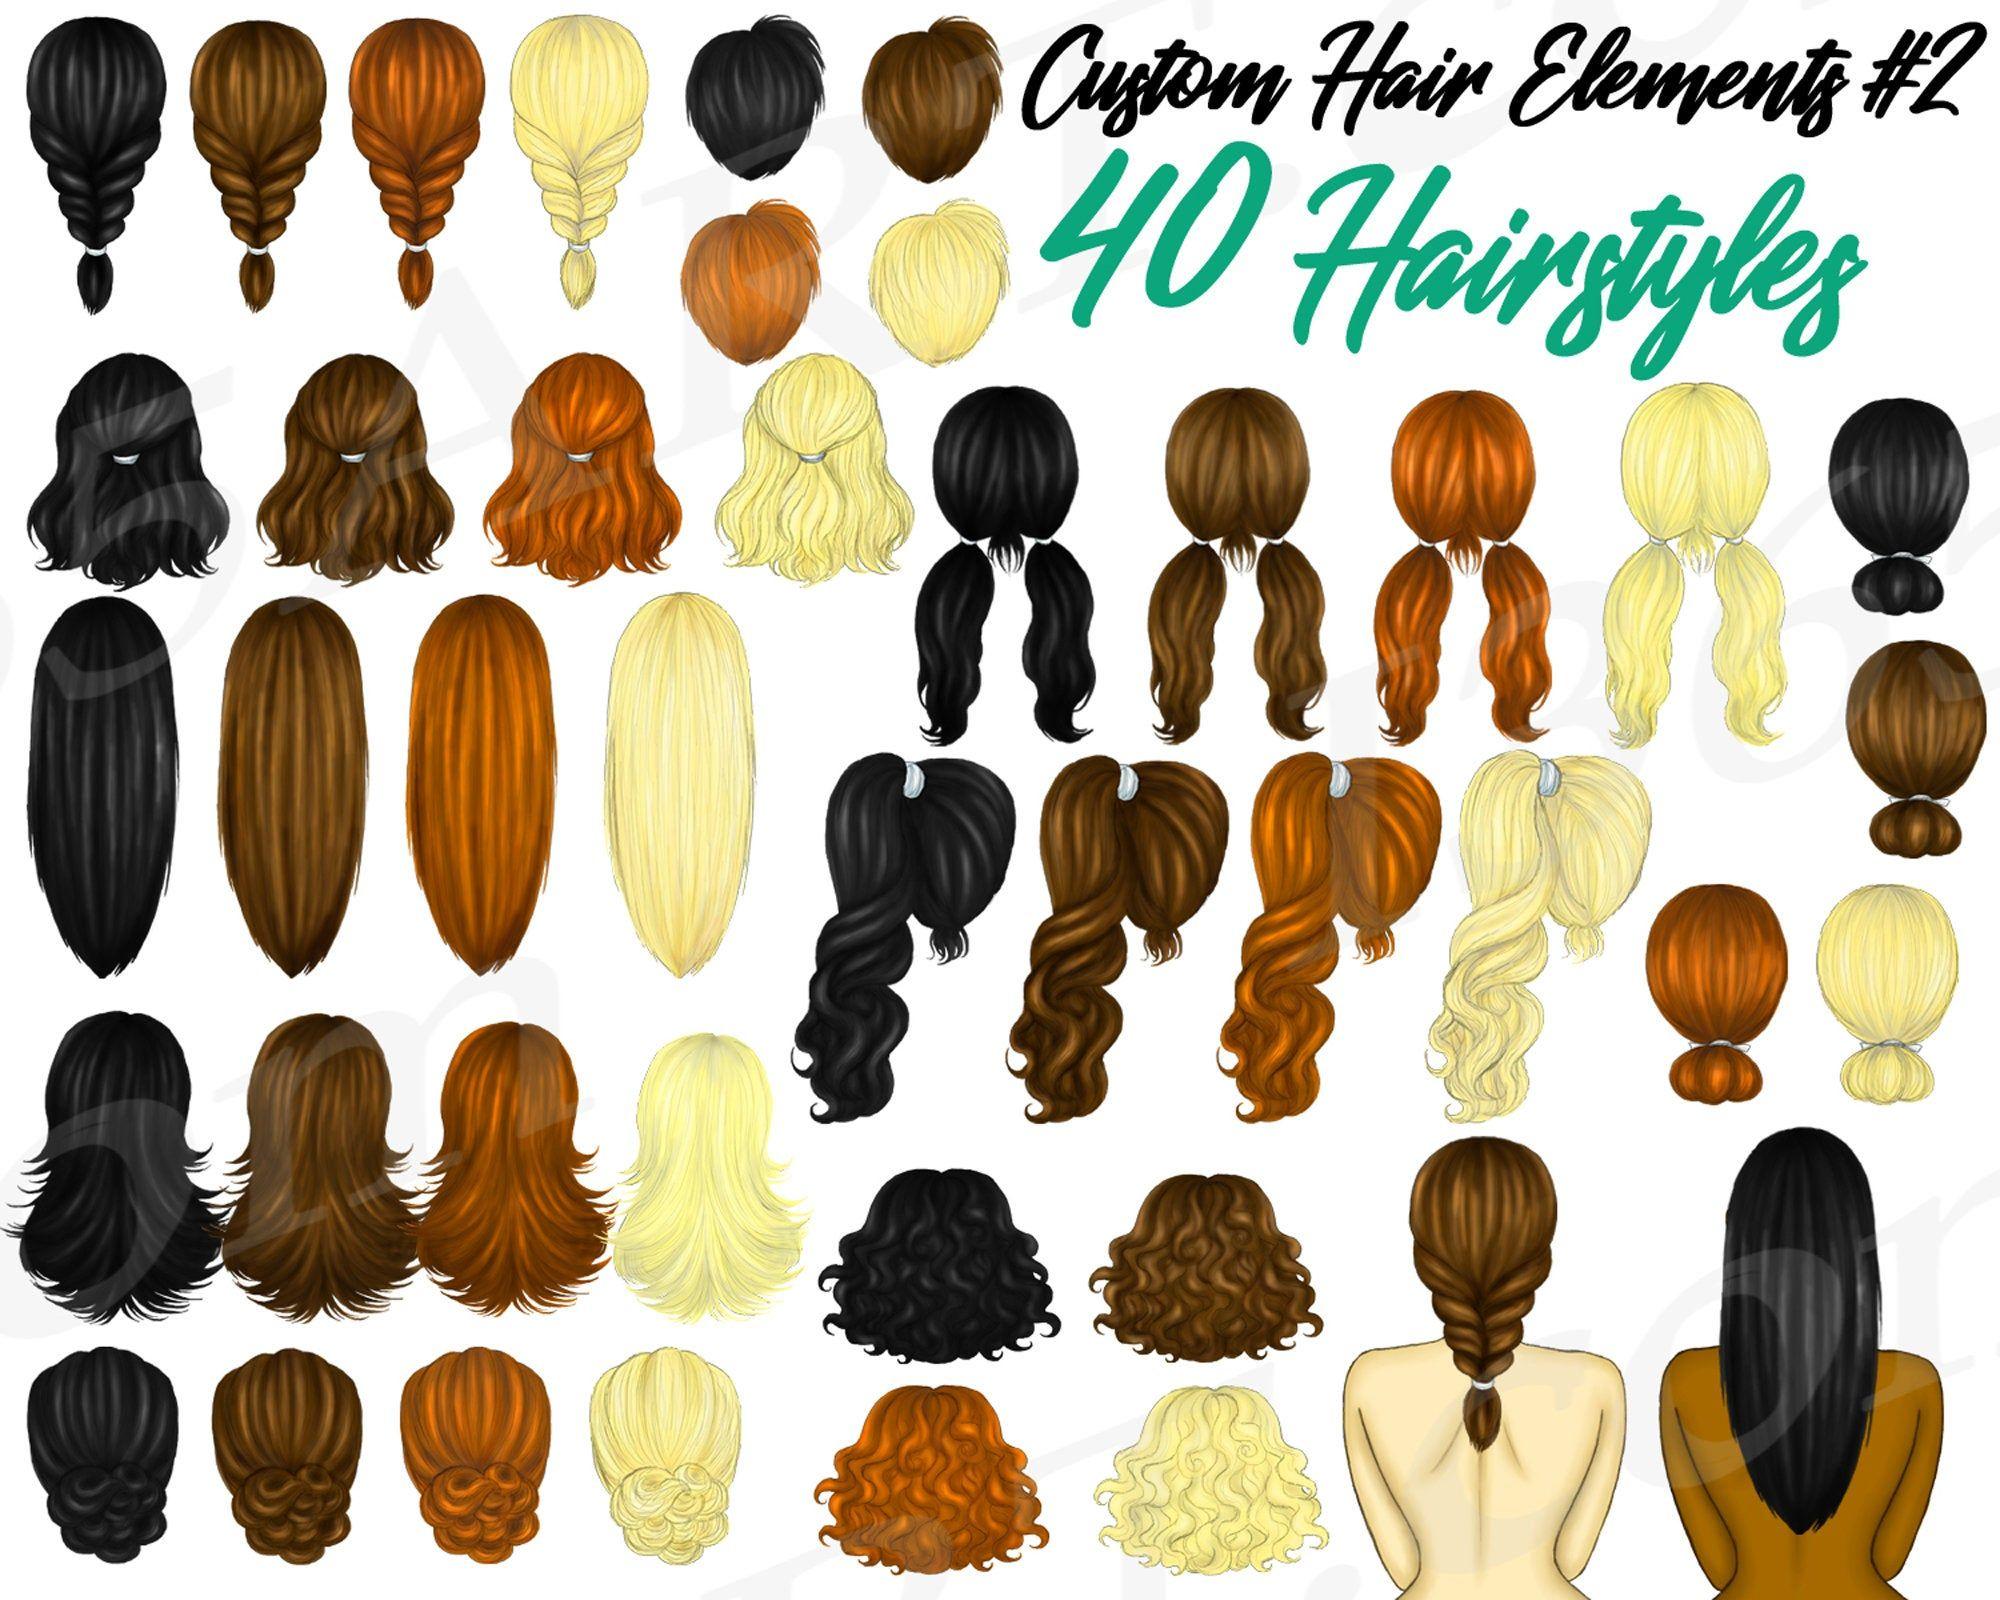 Custom Hairstyles Clipart Hairstyles Basic Hairstyles Etsy In 2020 Basic Hairstyles Hair Clipart Hair Styles